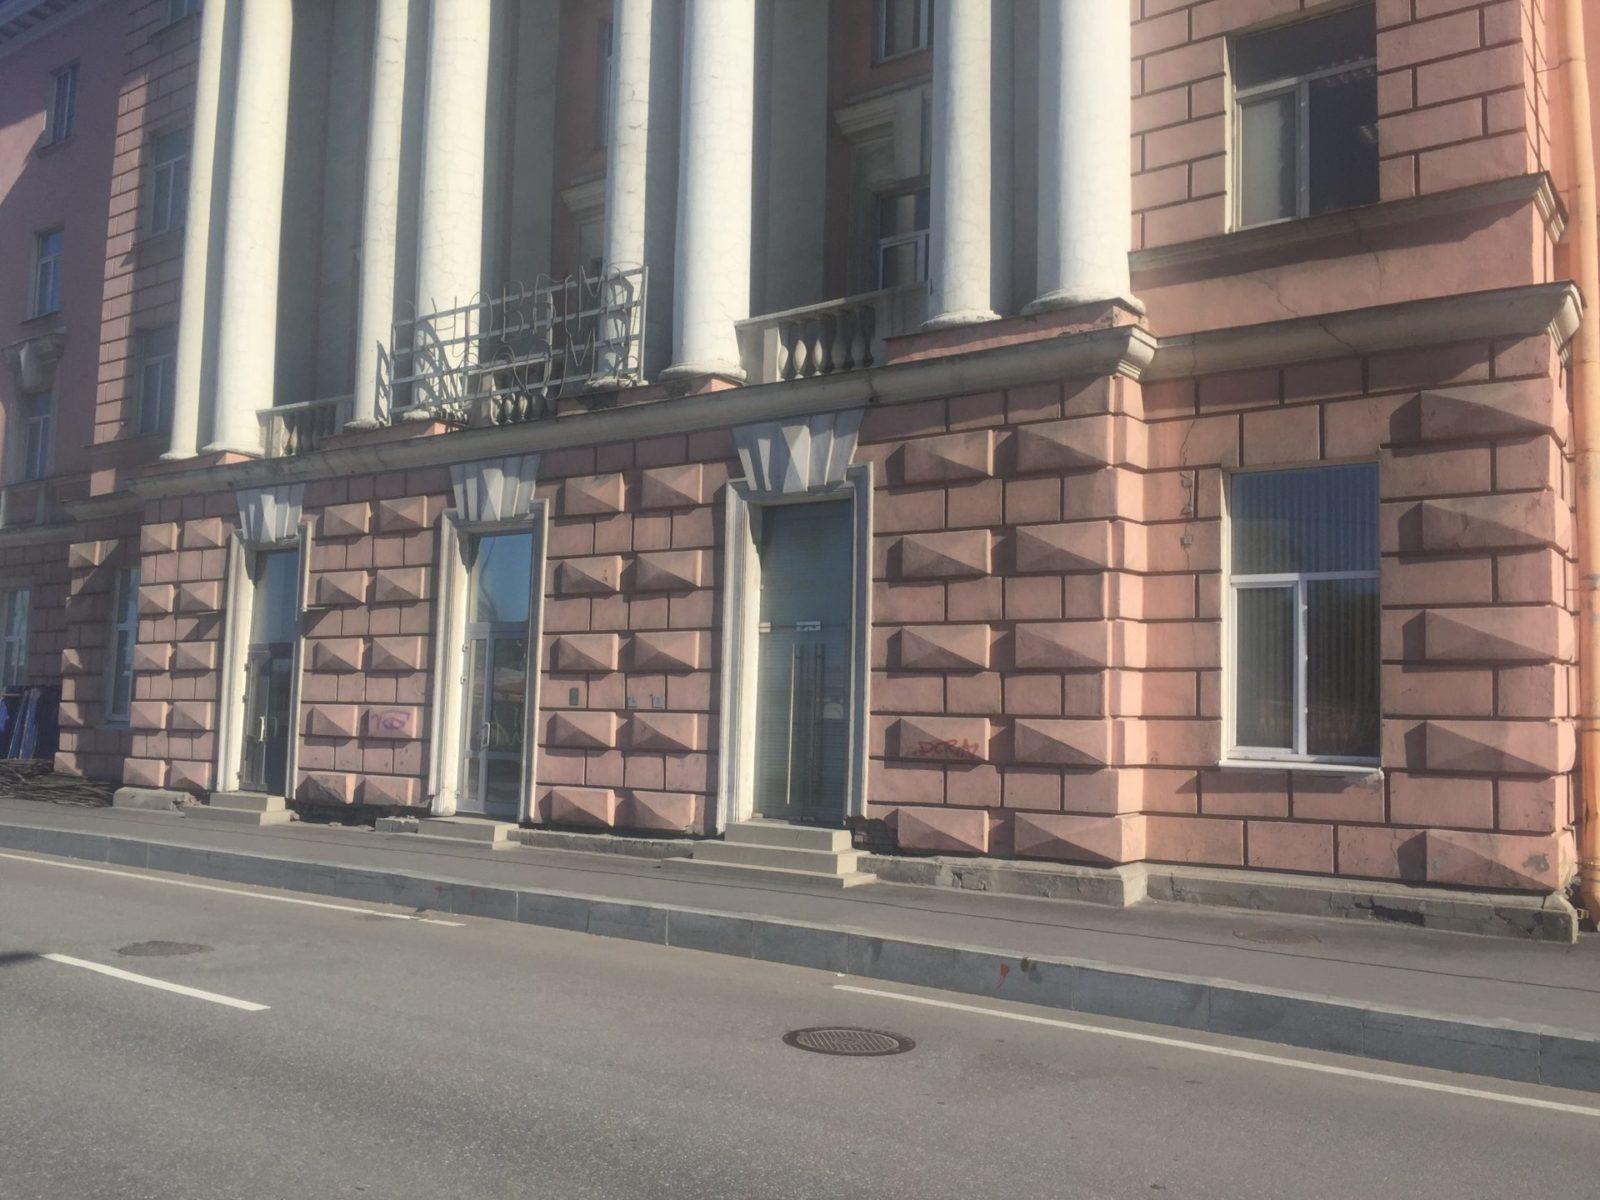 Цена ремонта фасада здания на ул. Набережная Обводного канала, д.14 в Санкт-Петербурге